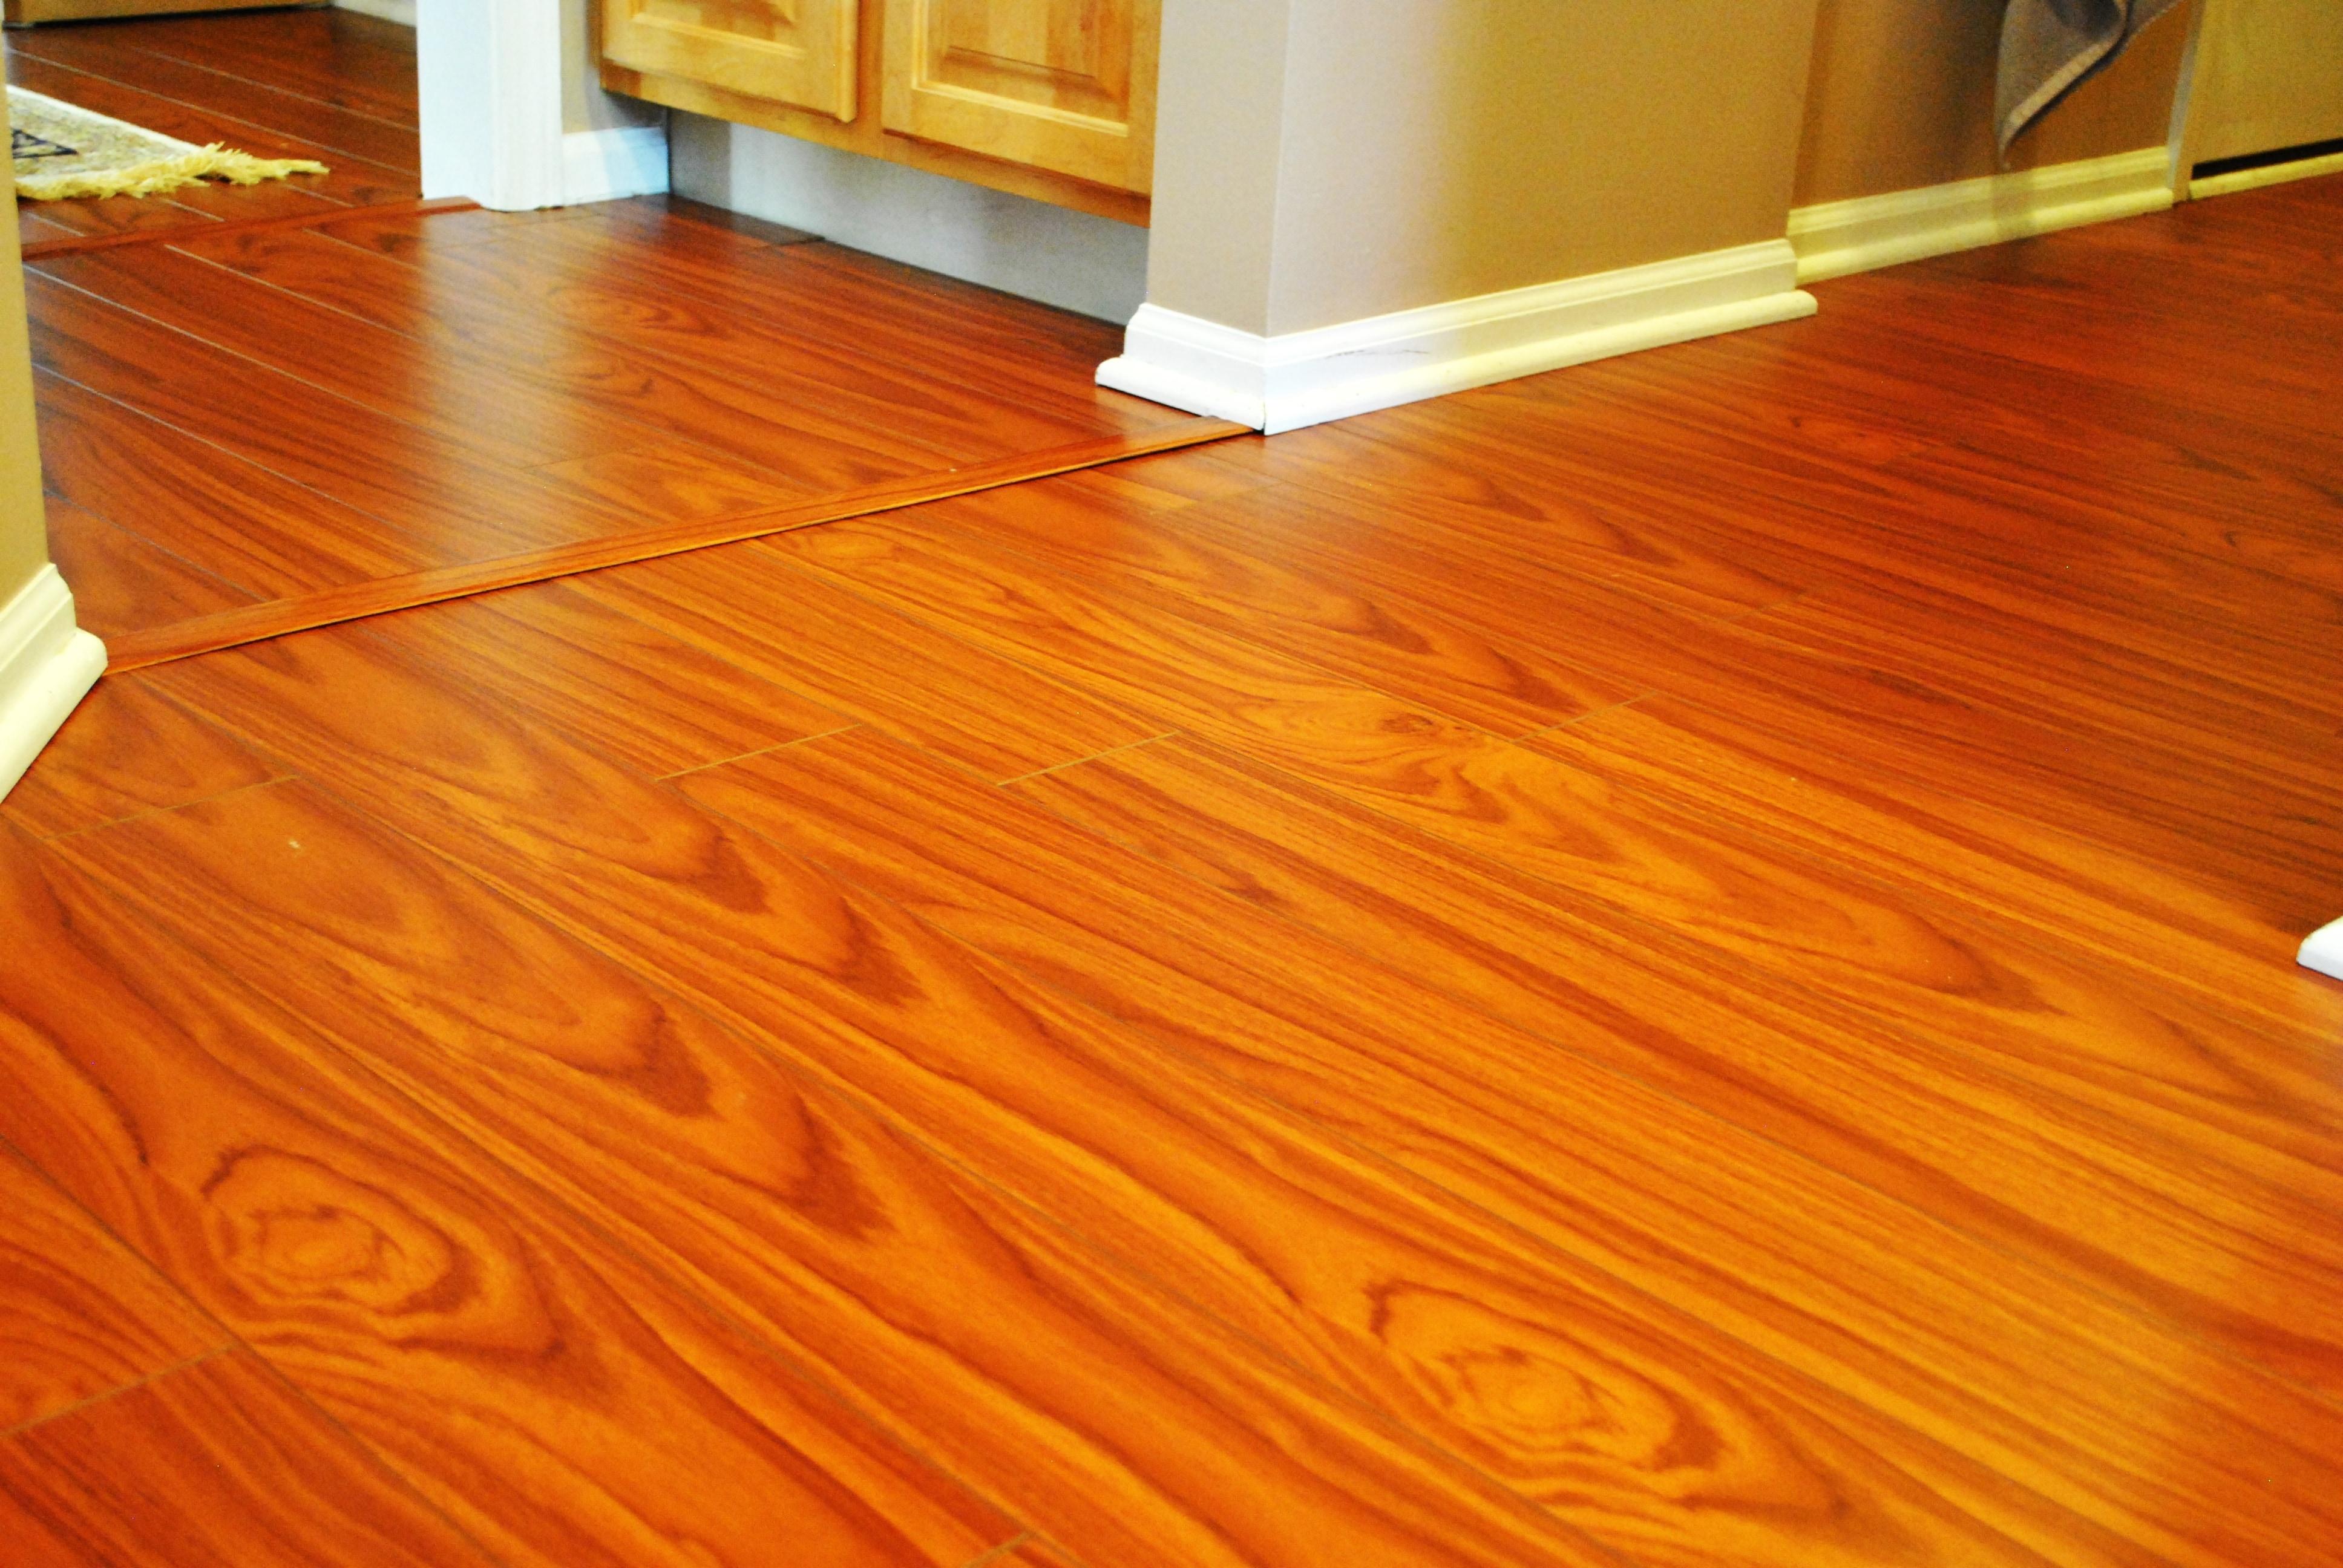 urban creekview creekviewmahogany flooring browns kraus textured floors laminate reds town apex tag mahogany